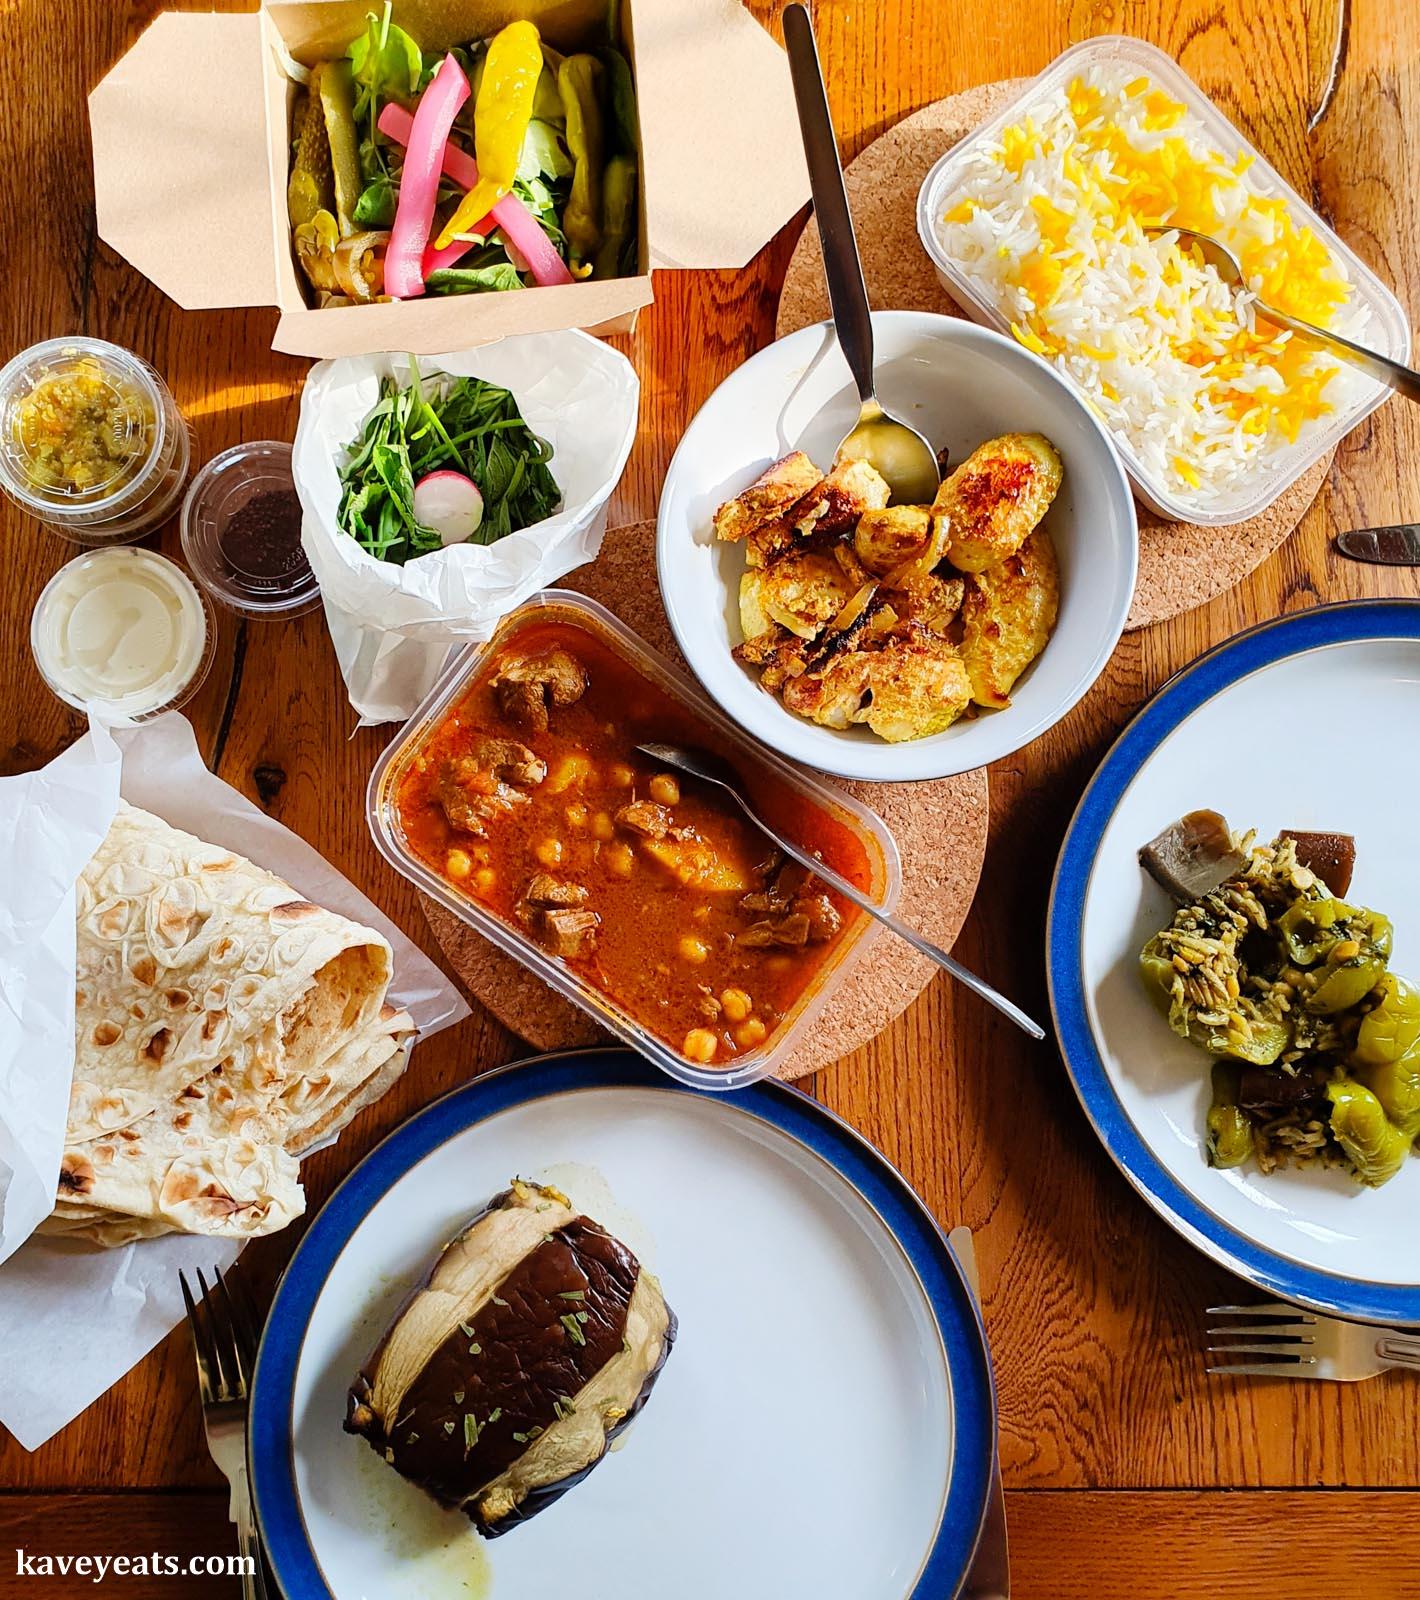 Joojeh kebab (Persian chicken kebab) and Ab goosht (lamb and aubergine hot pot)